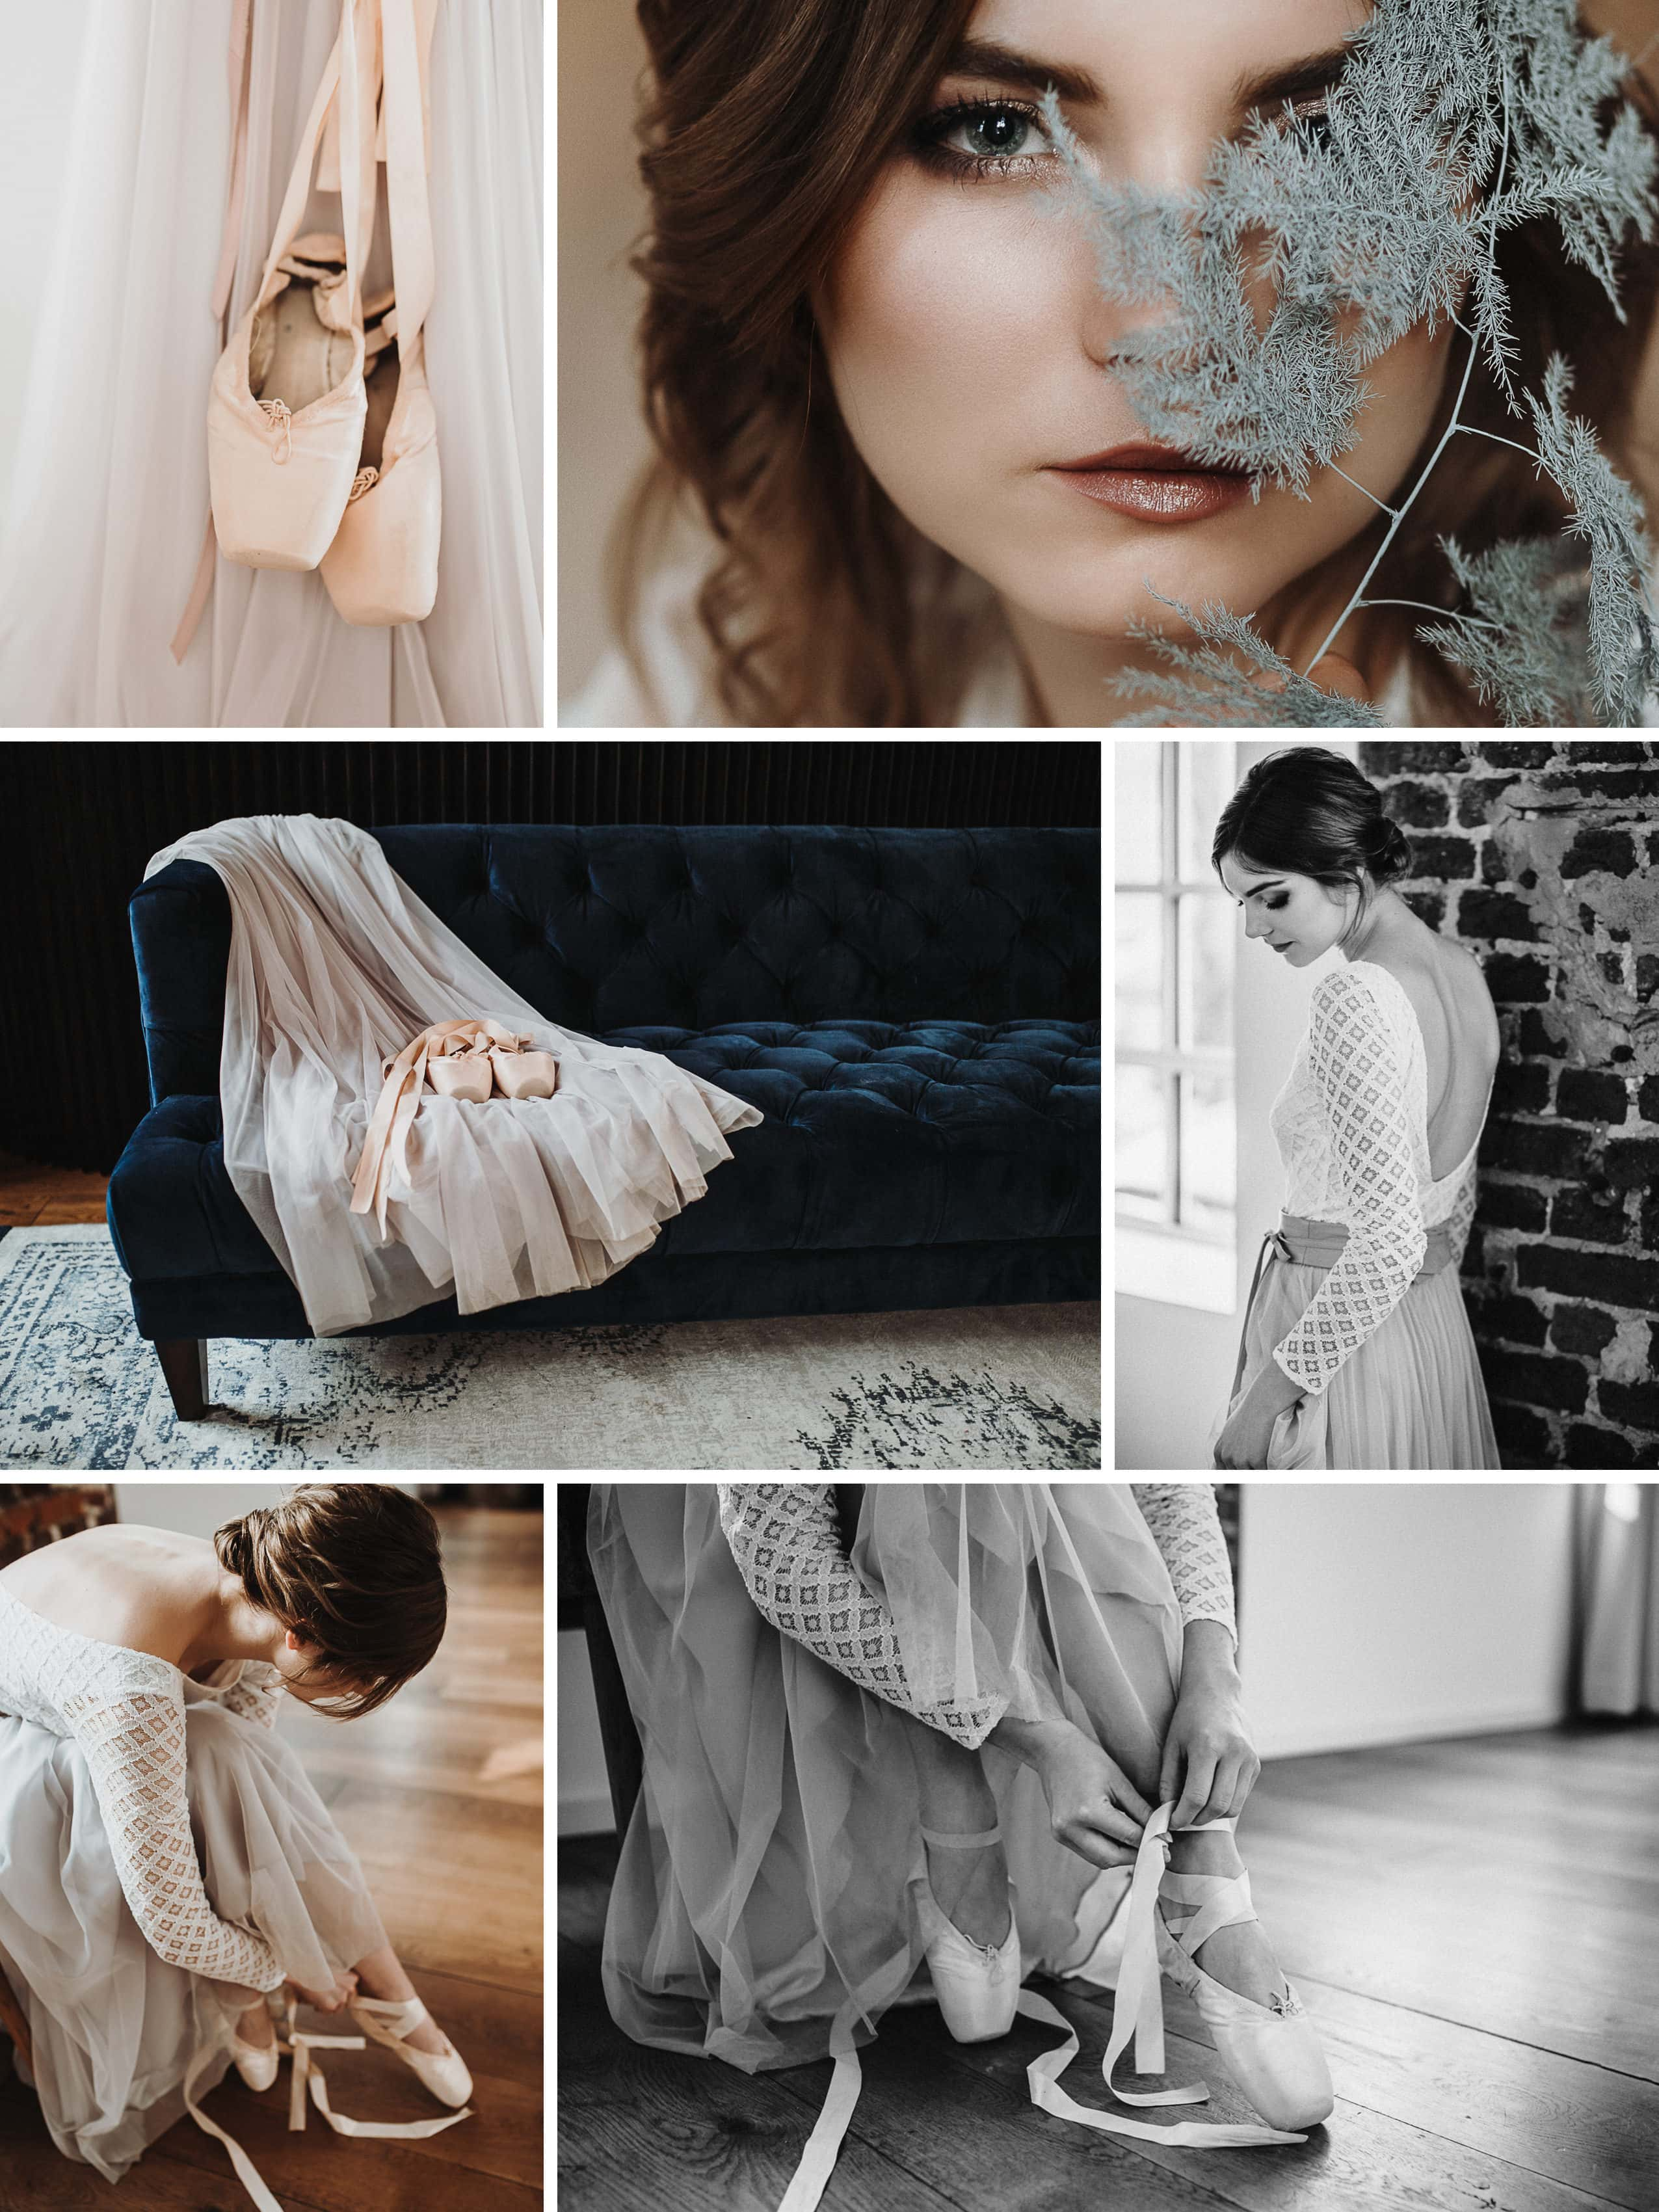 Ballerina Frieda Therés Hochzeitsblog